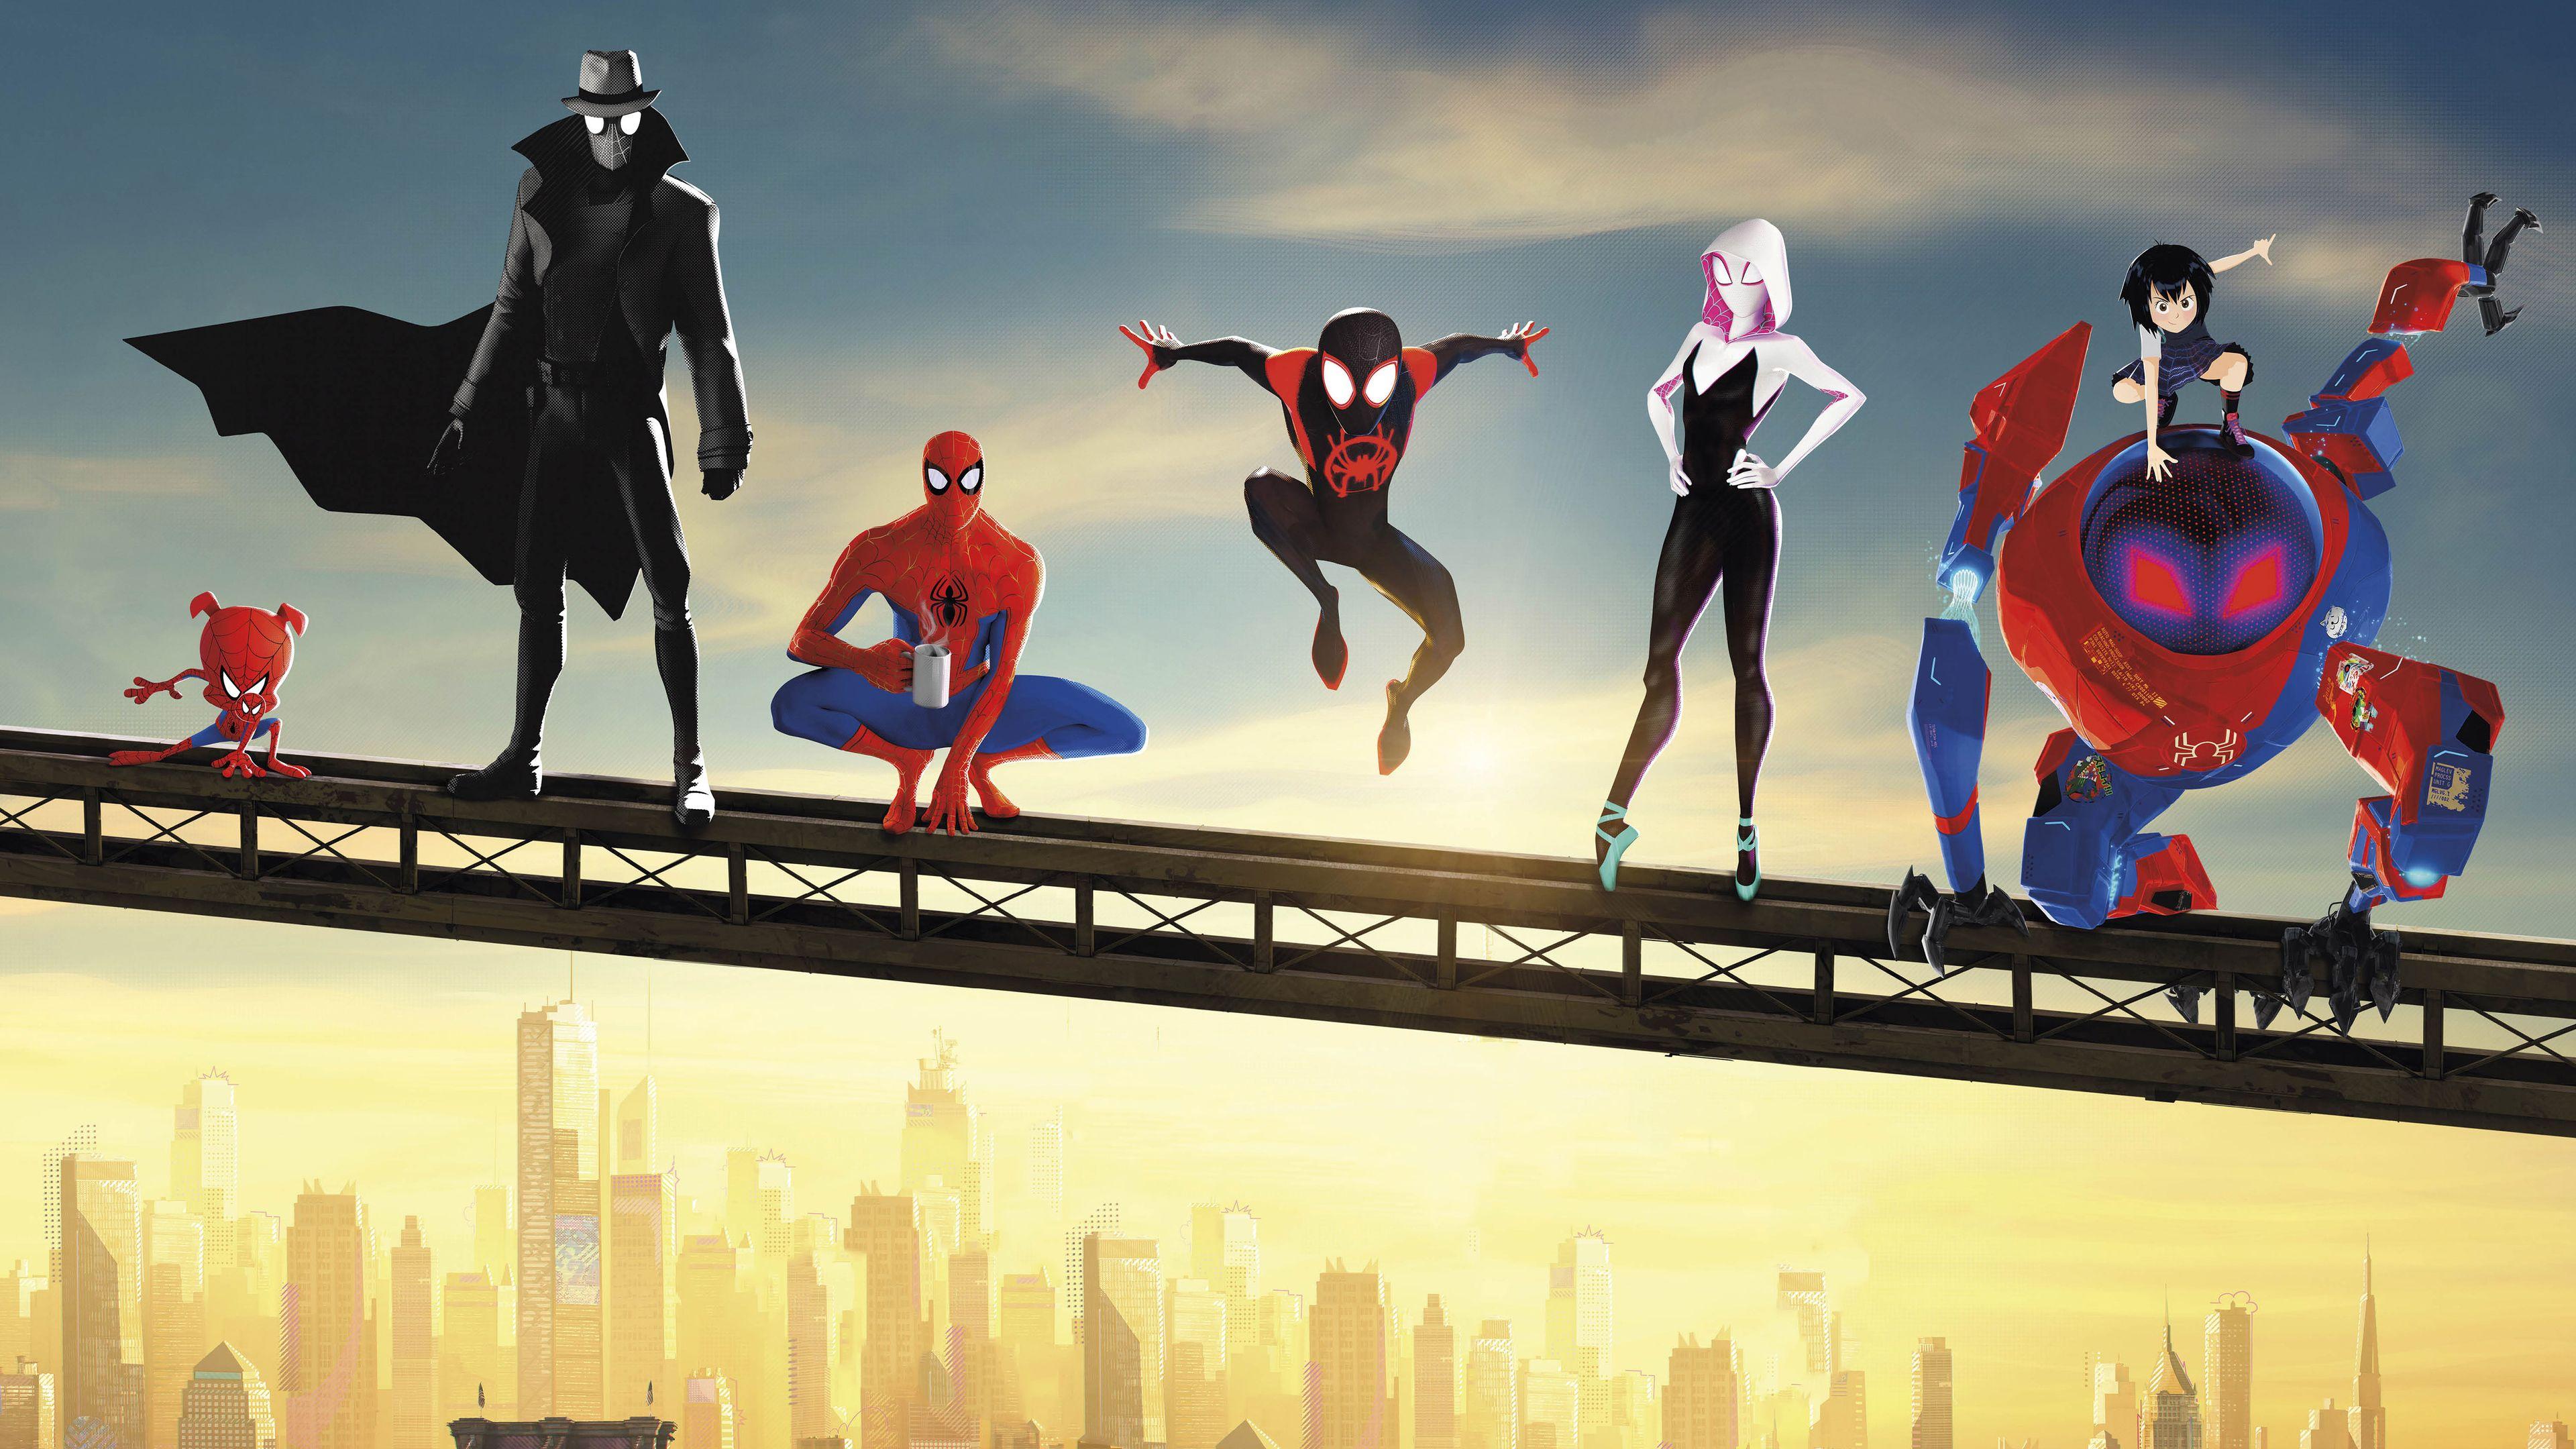 Spiderman Into The Spider Verse Movie Poster Spiderman Wallpapers Spiderman Spiderman Into The Spider Verse Ultimate Spiderman Spiderman Into The Spiderverse